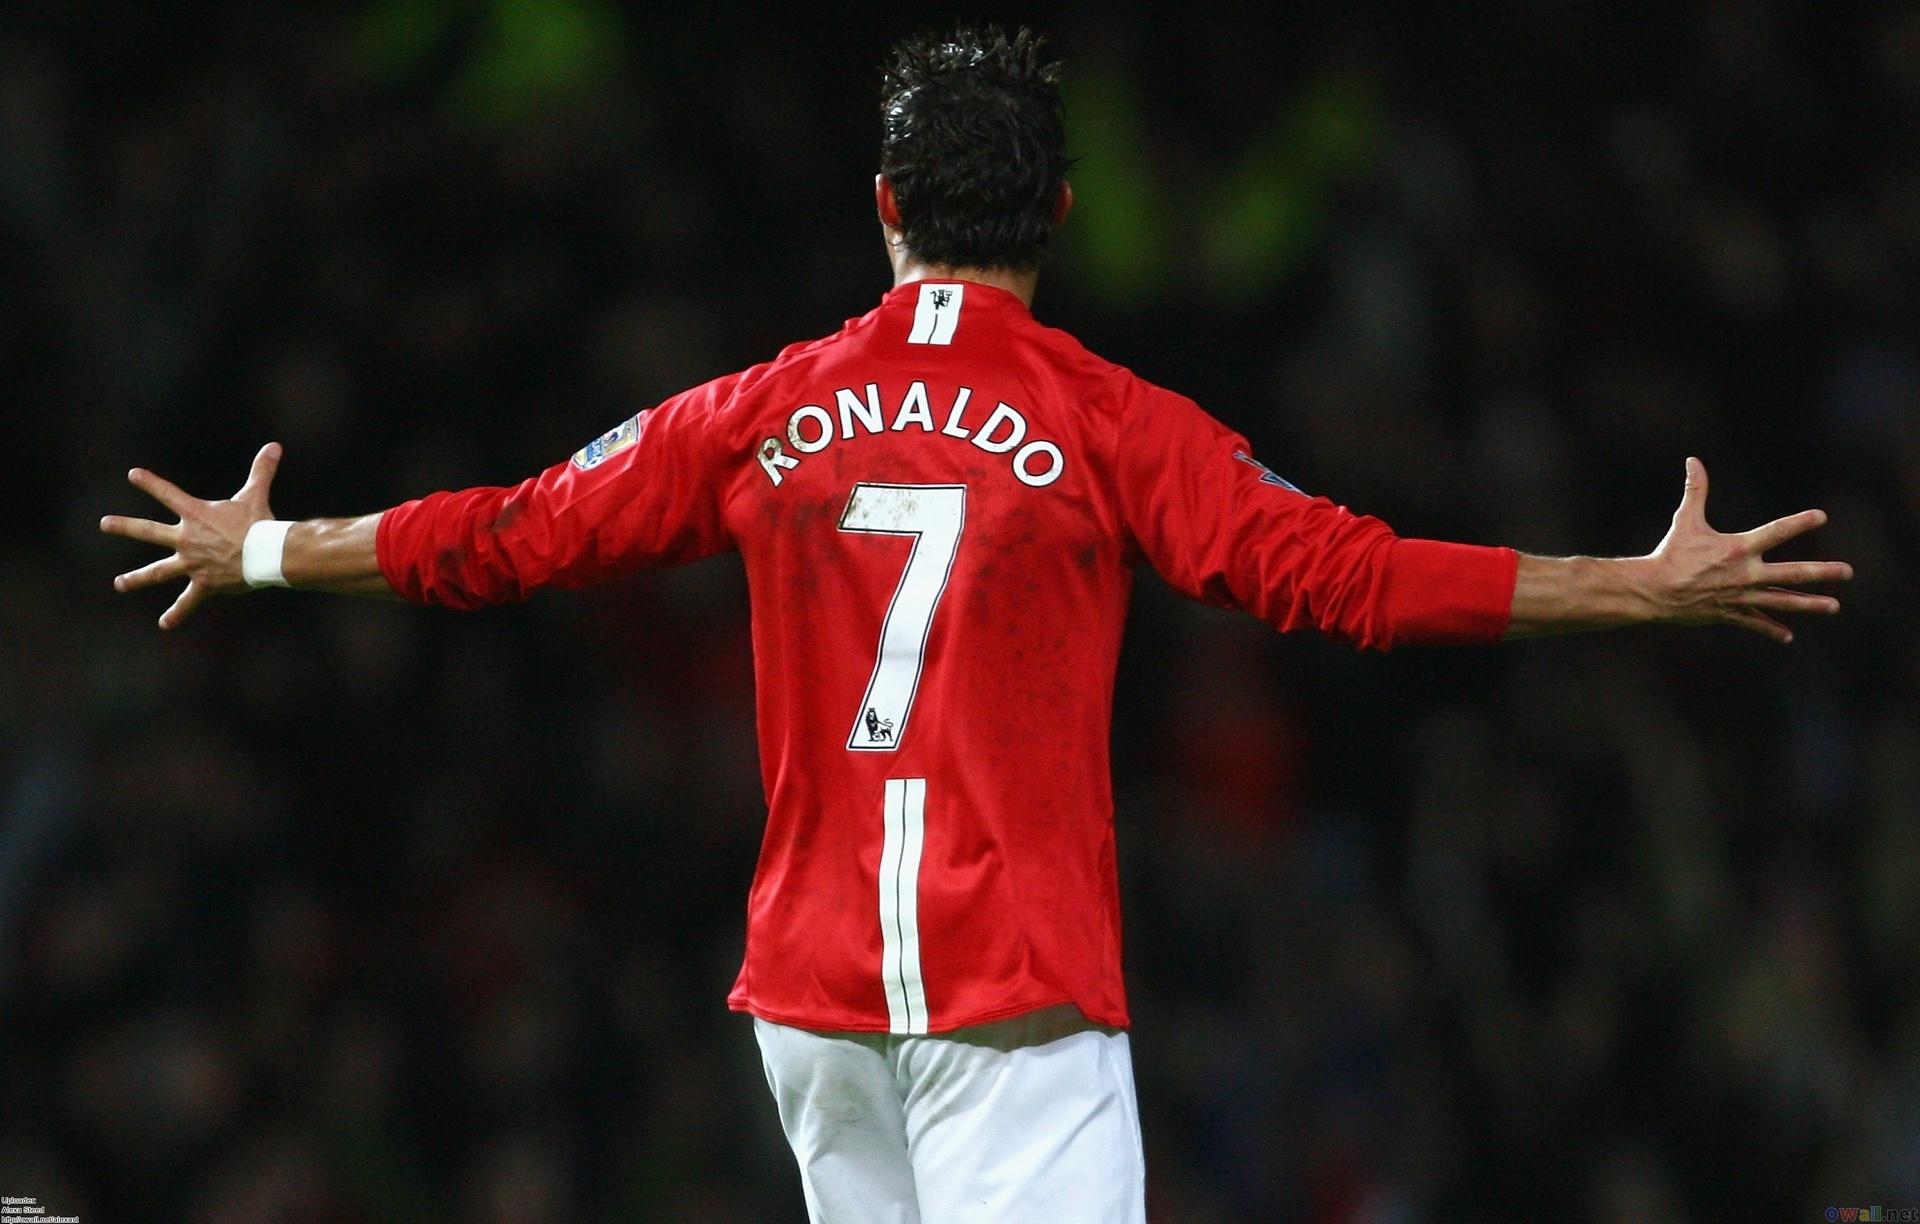 All this Ronaldo madness needs to stop